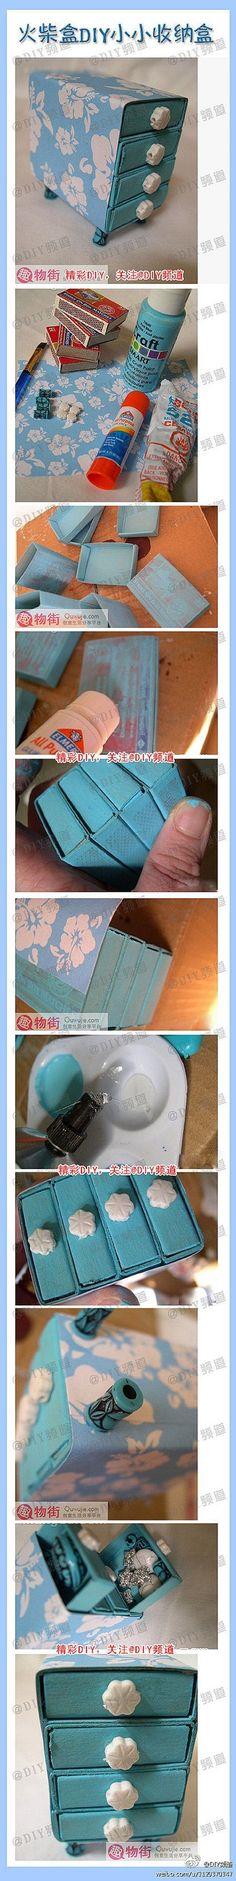 Matches Box Drawer DIY Projects | UsefulDIY.com